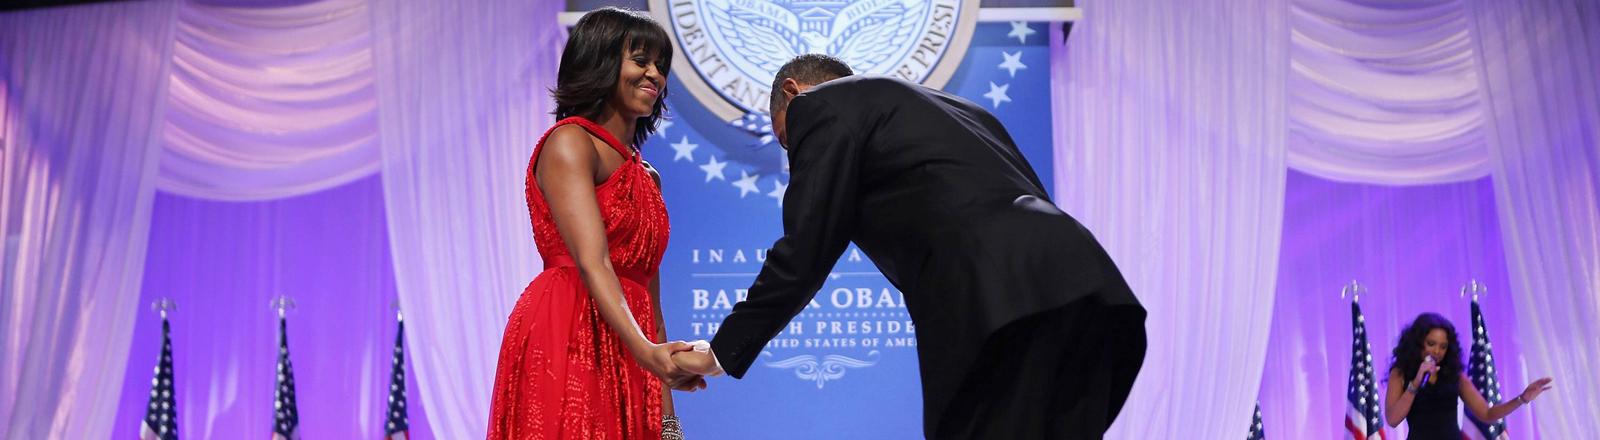 Barack Obama verneigt sich vor seiner Frau Michelle.